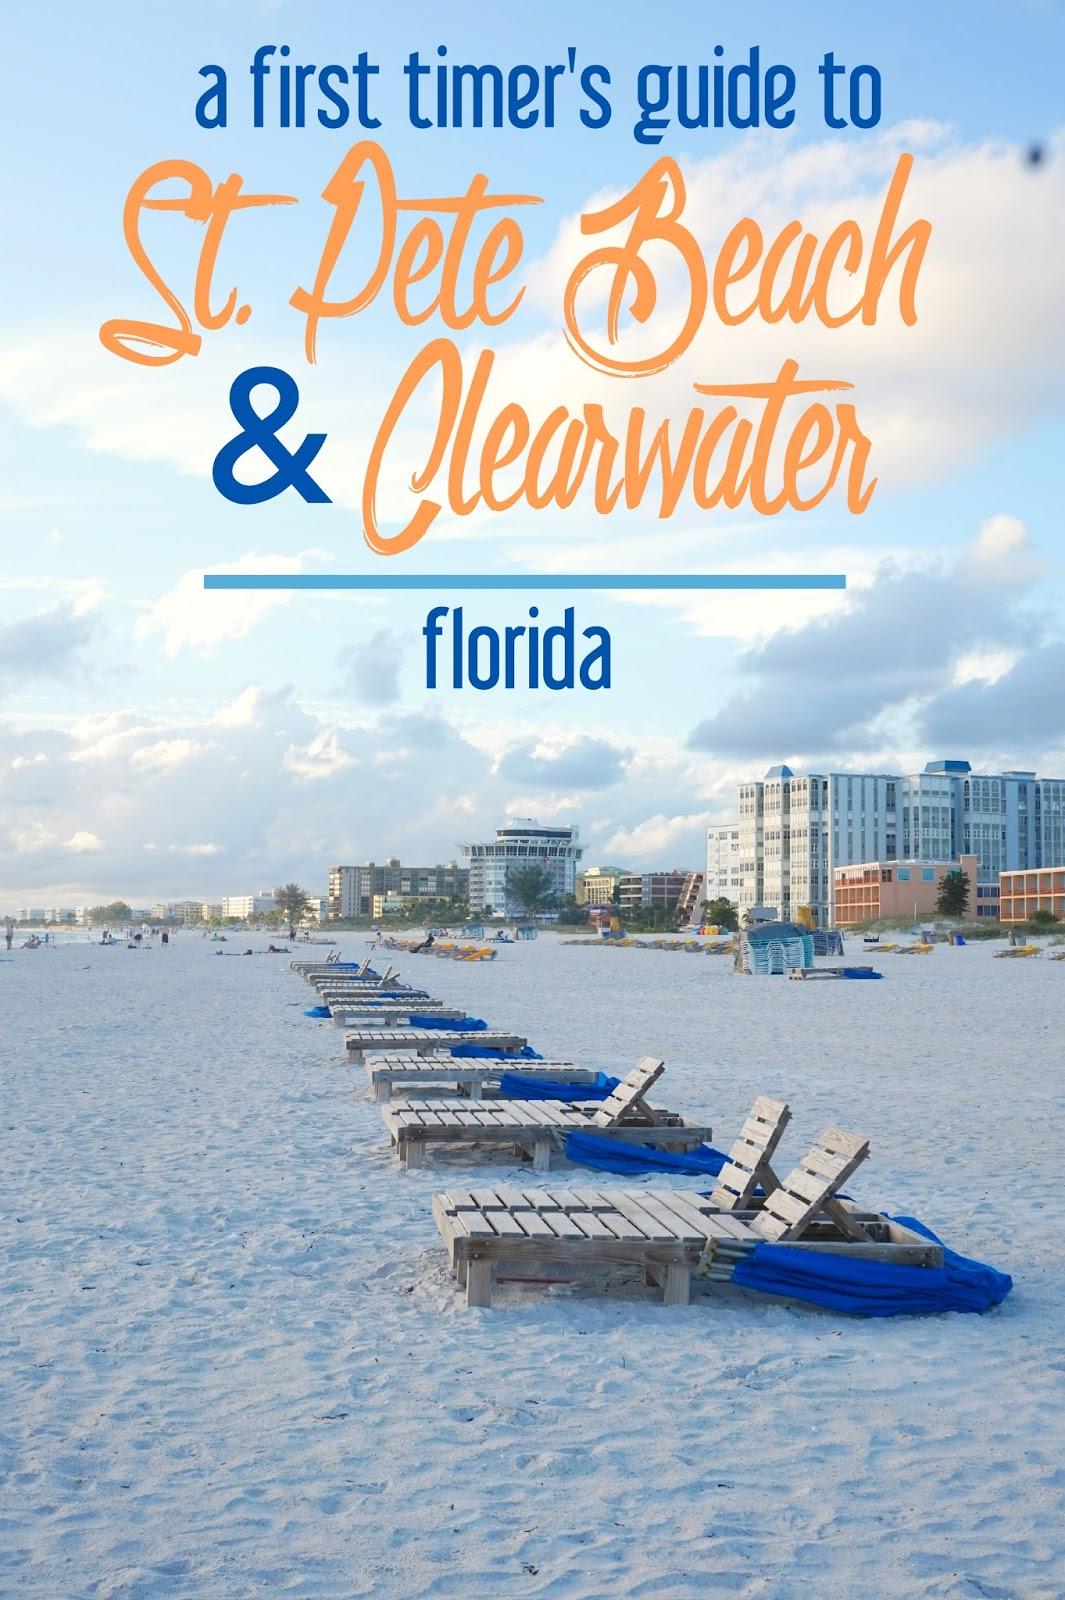 Island Way Clearwater Fl